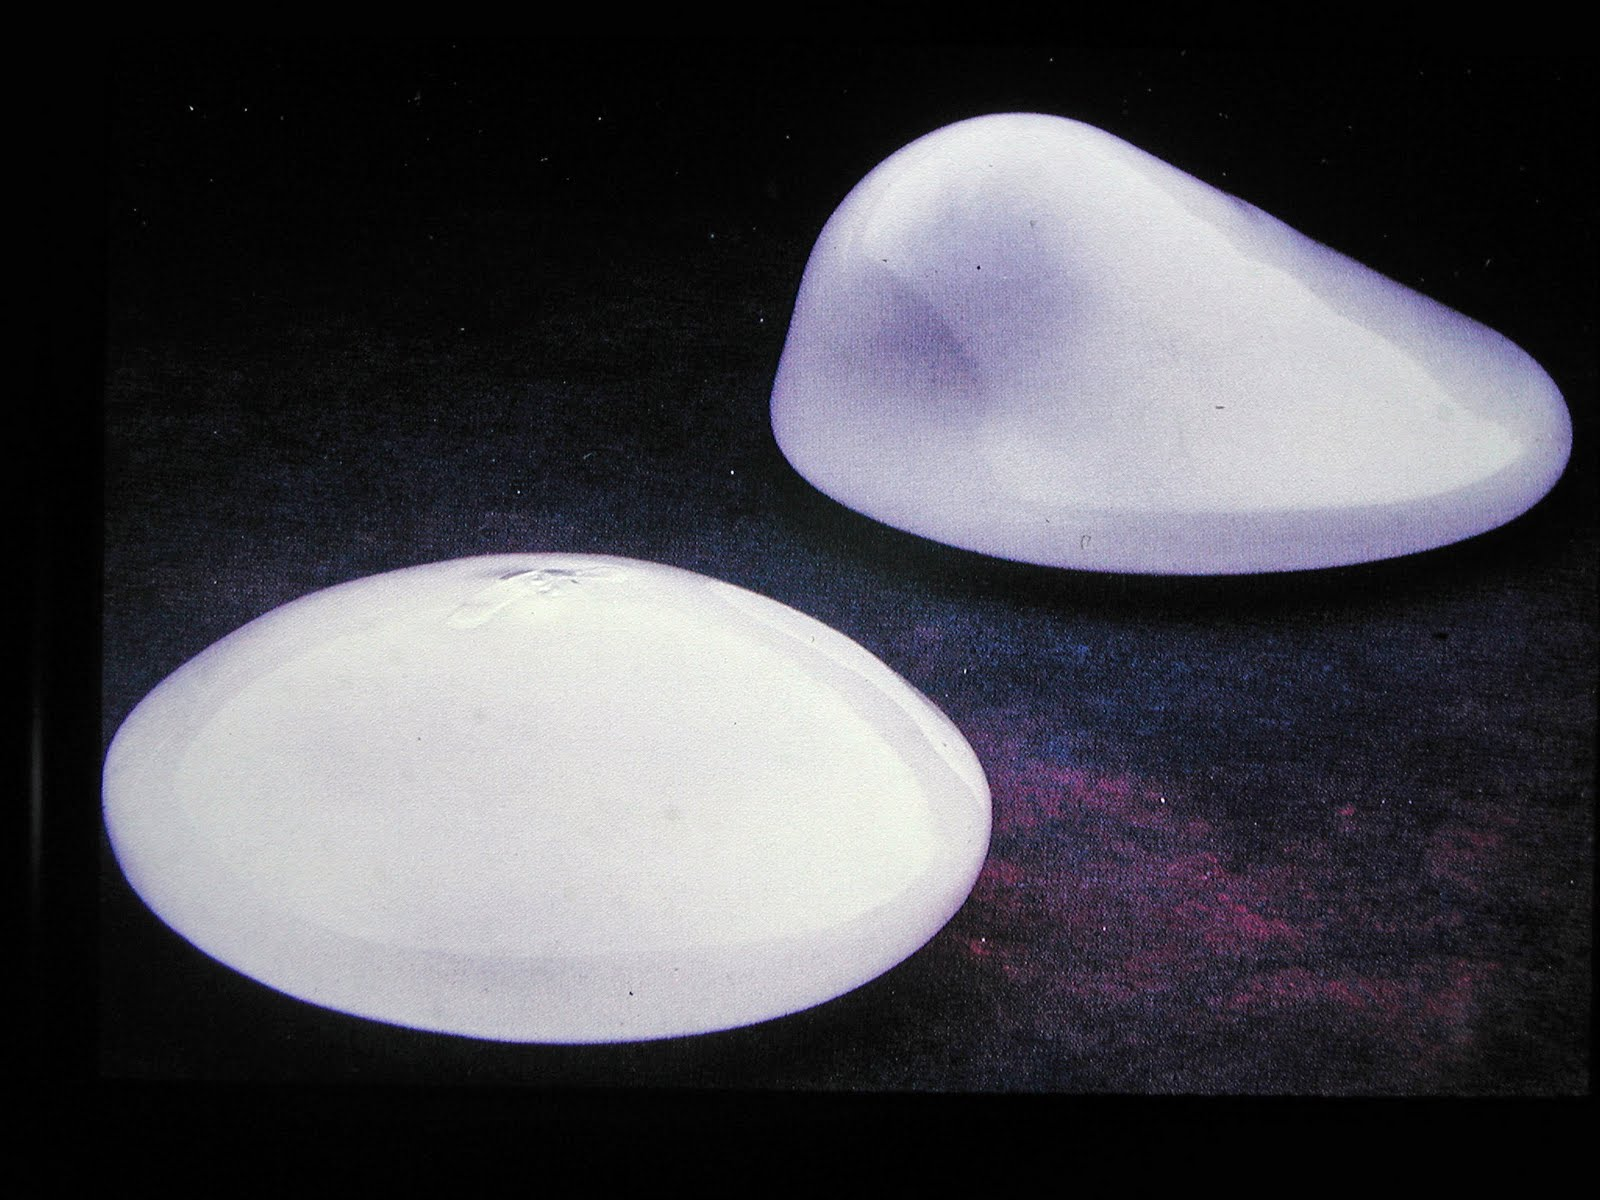 http://3.bp.blogspot.com/-p2HmU1nVhIY/TlUohSjgMtI/AAAAAAAADkw/zU0DaIkvx5Y/s1600/breast-implant-profiles-indianapolis-dr-barry-eppley1.jpg